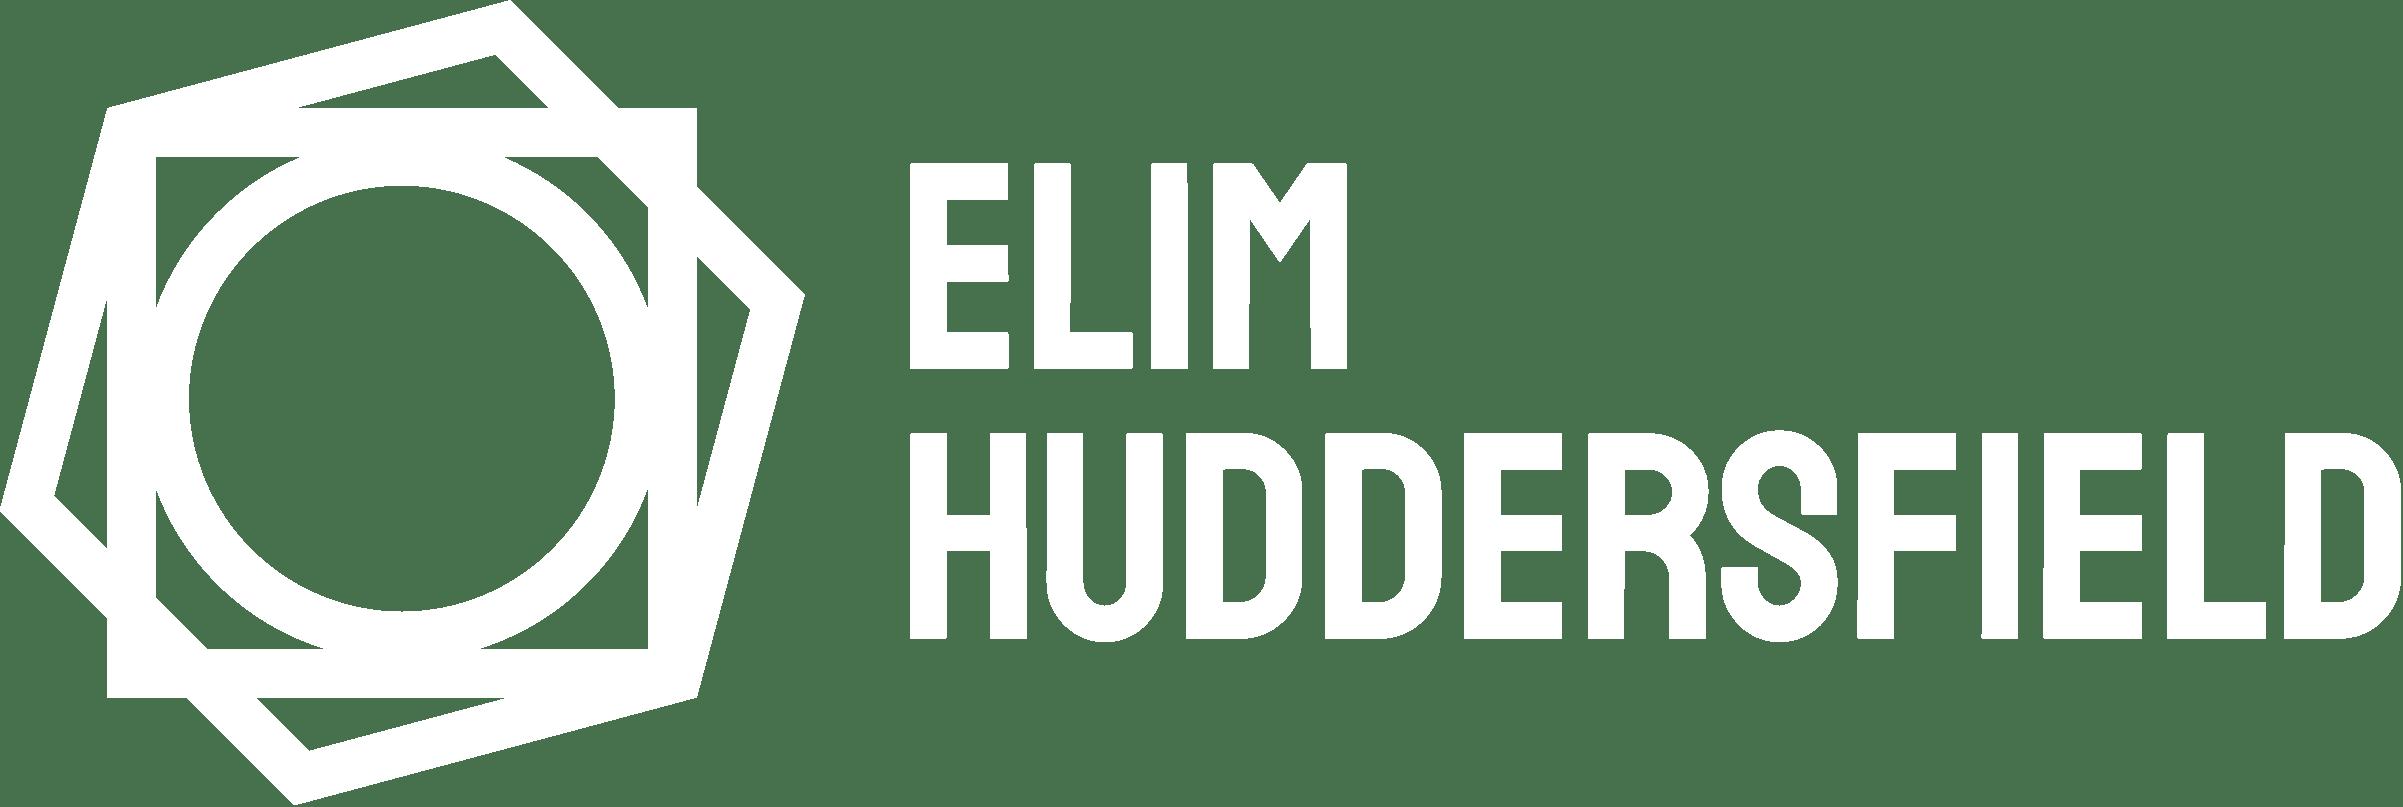 Elim Huddersfield